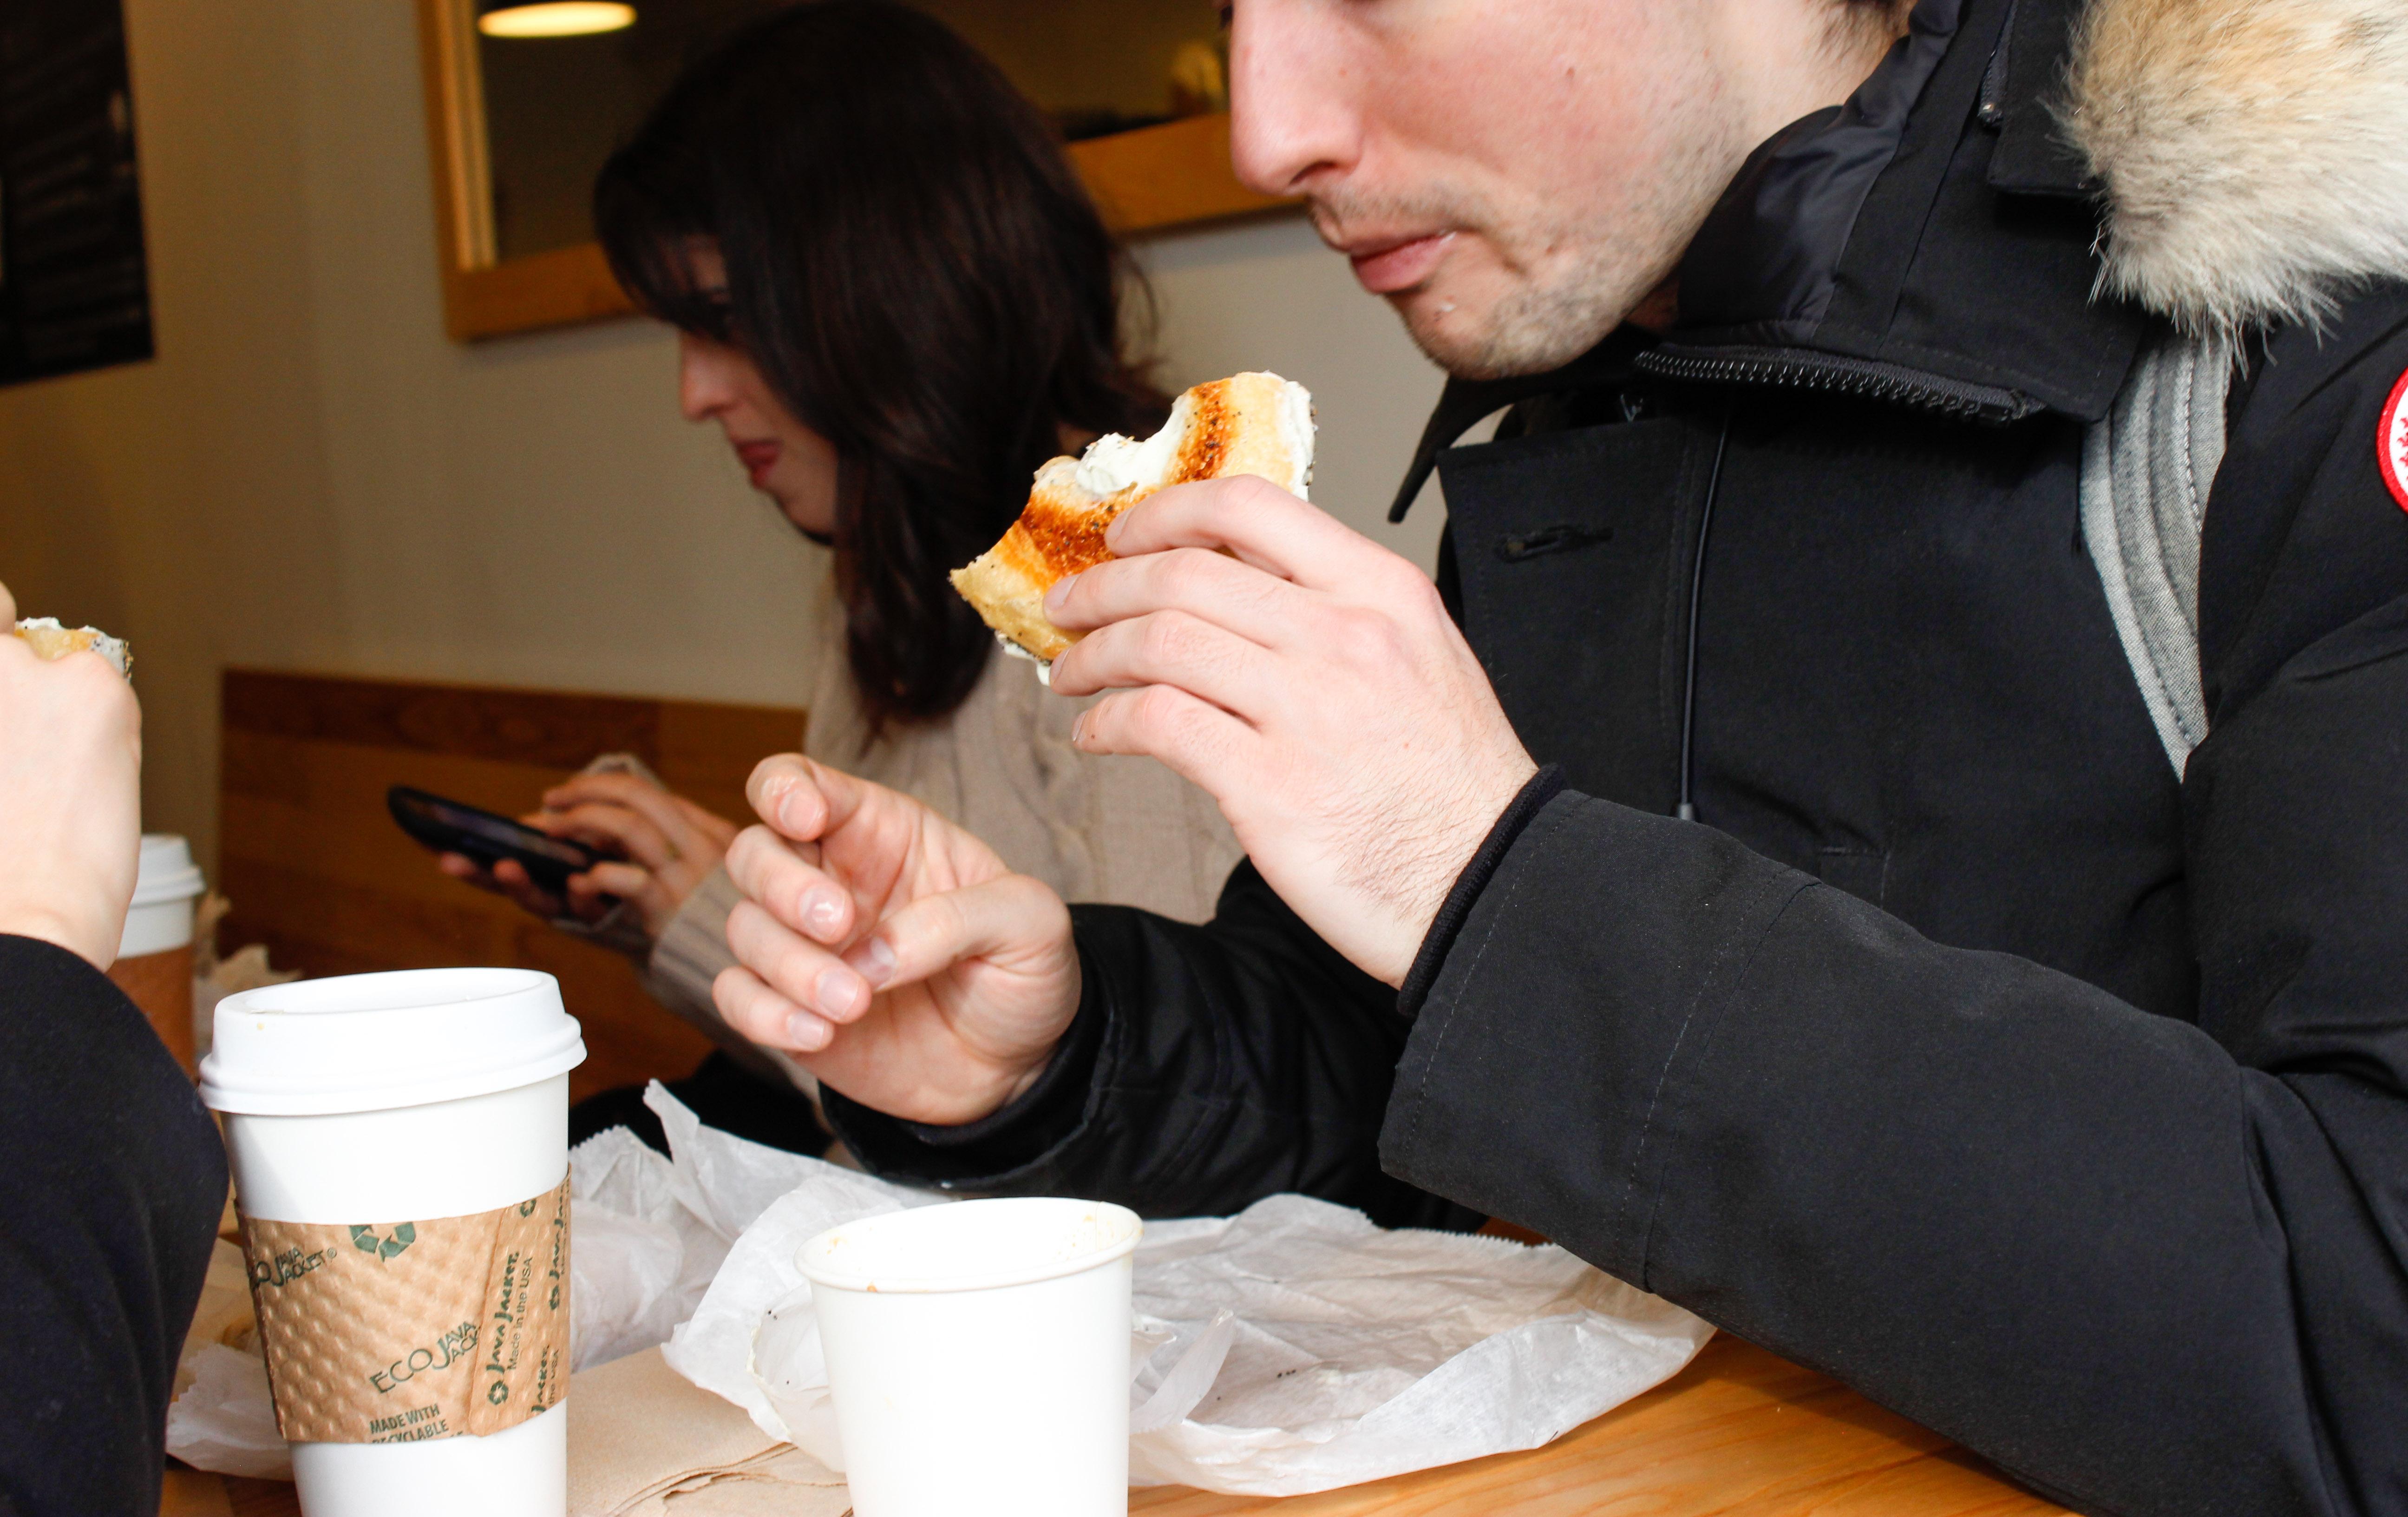 Breakfast at Bagelsaurus